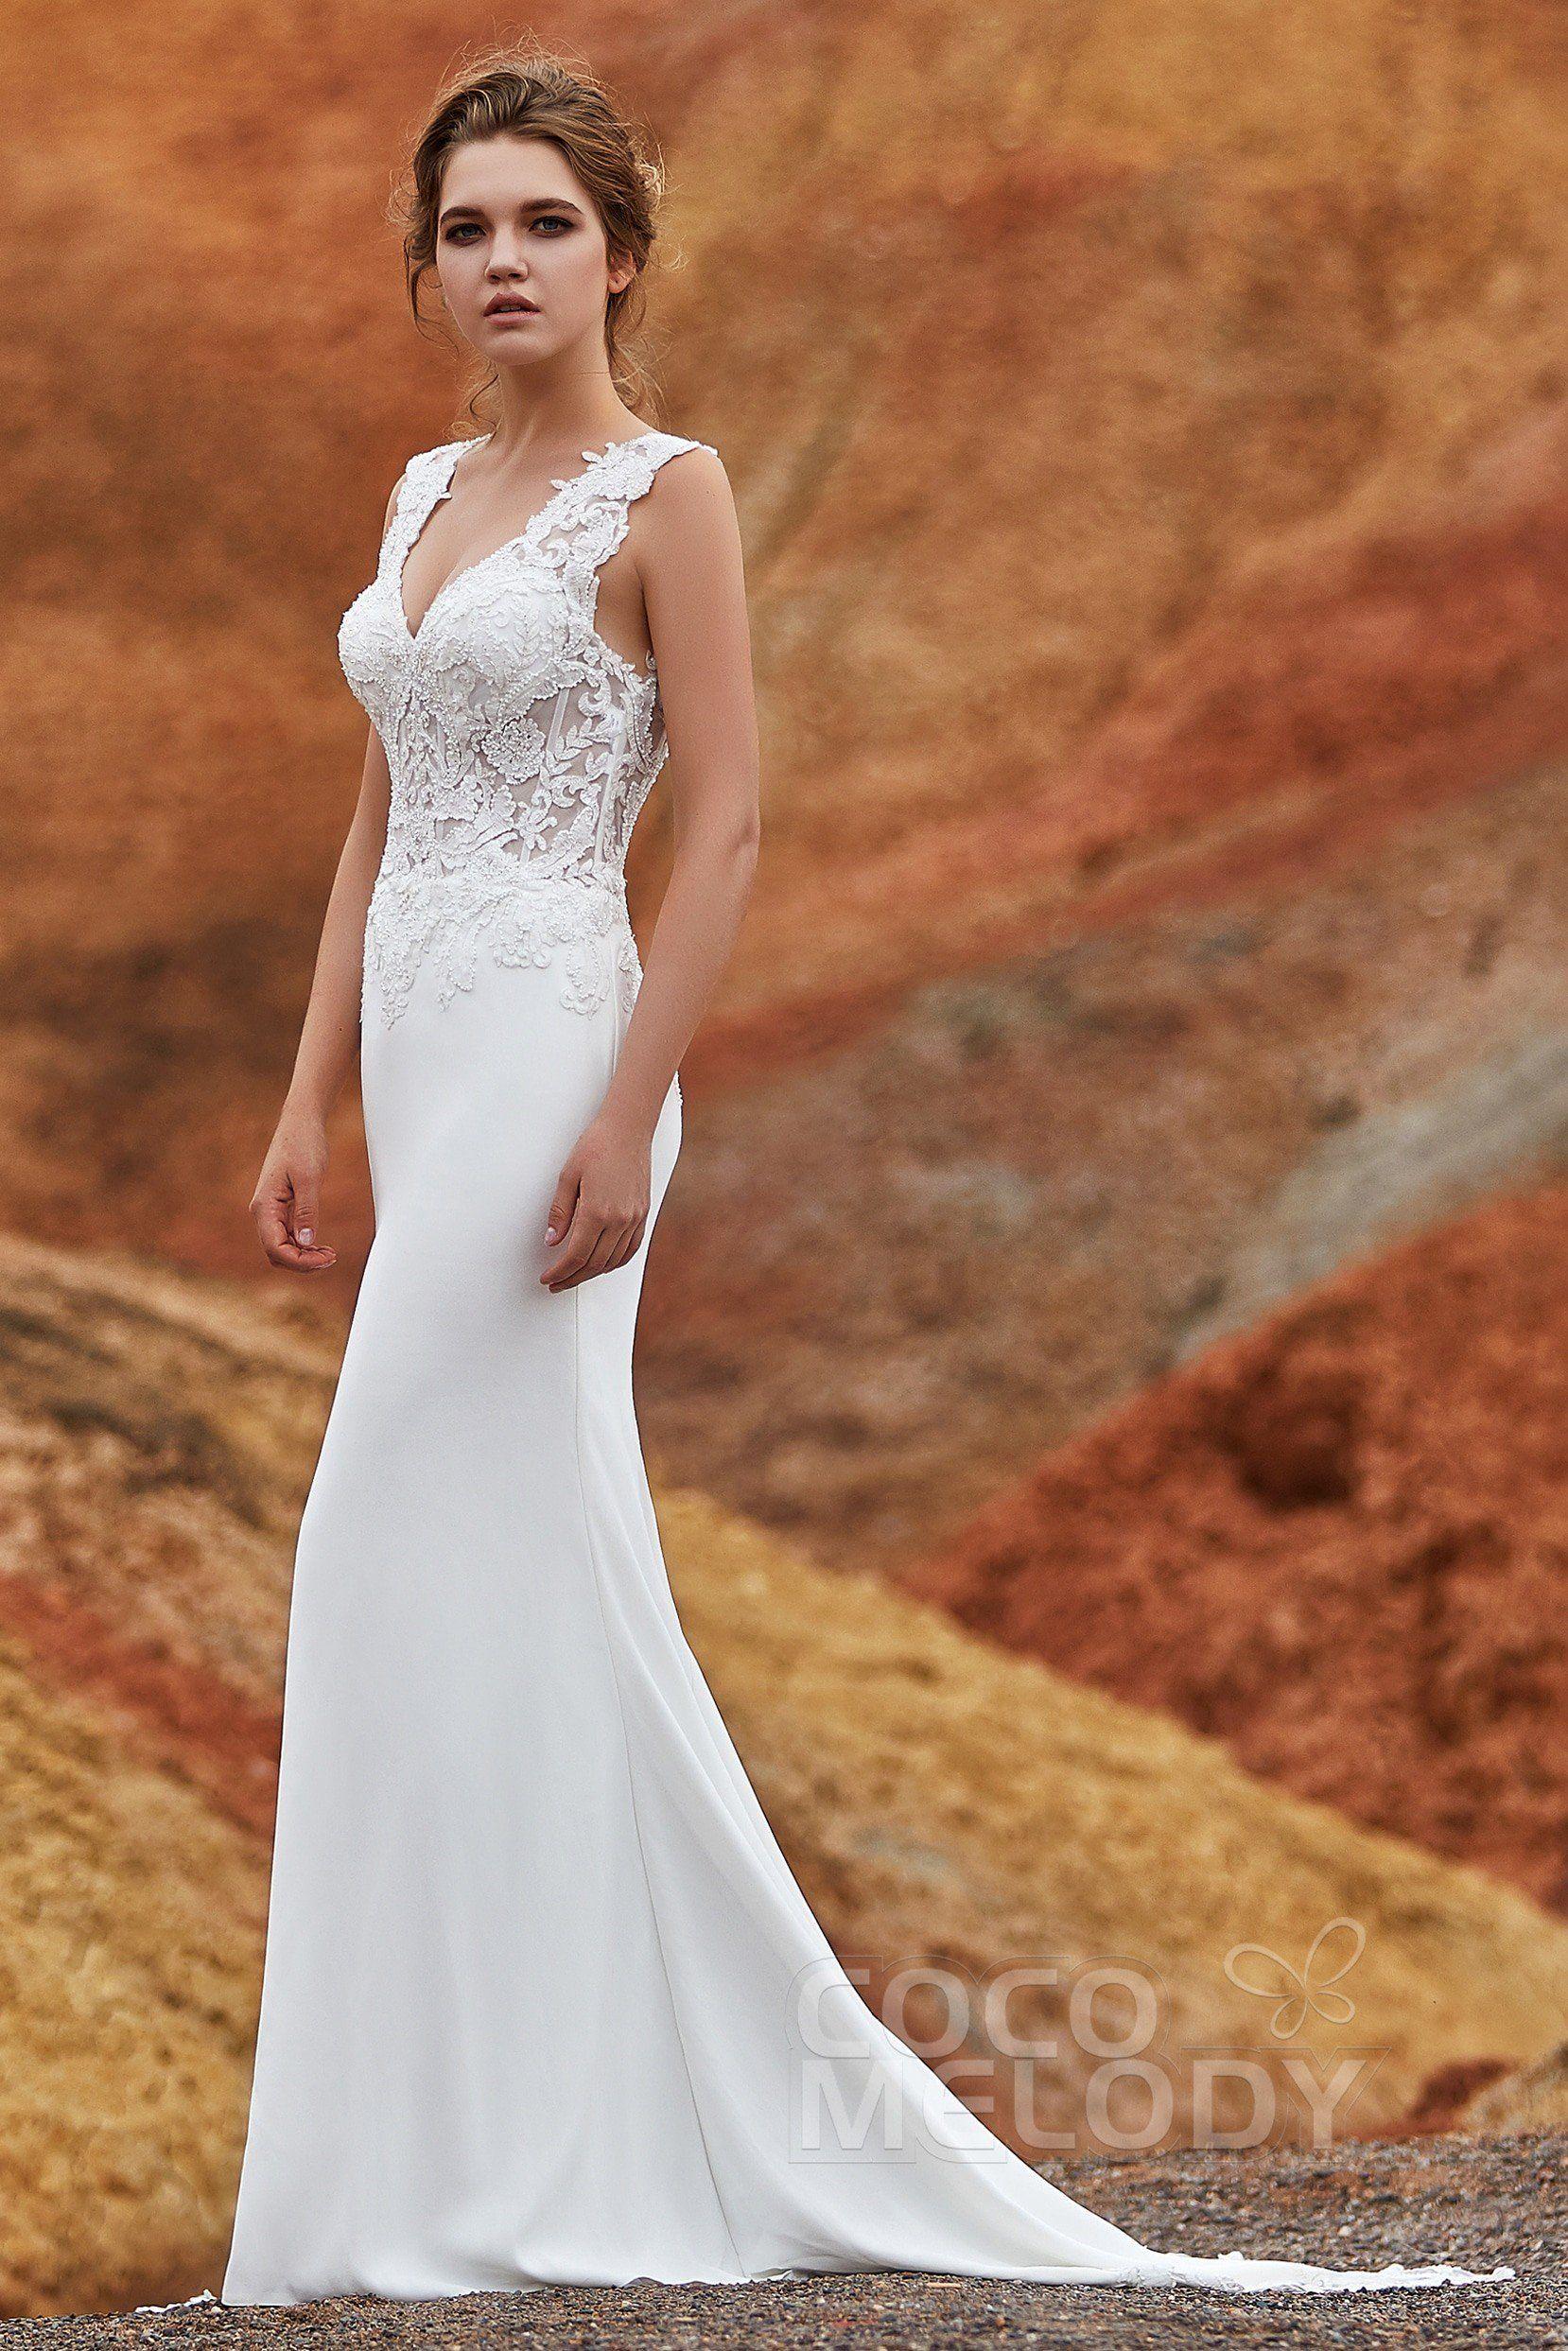 e1a53f79d48a4 Trumpet-Mermaid Chapel Train Knitted Fabric Wedding Dress #LD5816 # cocomelody #weddingdress #mermaidweddingdress #2019newcollection